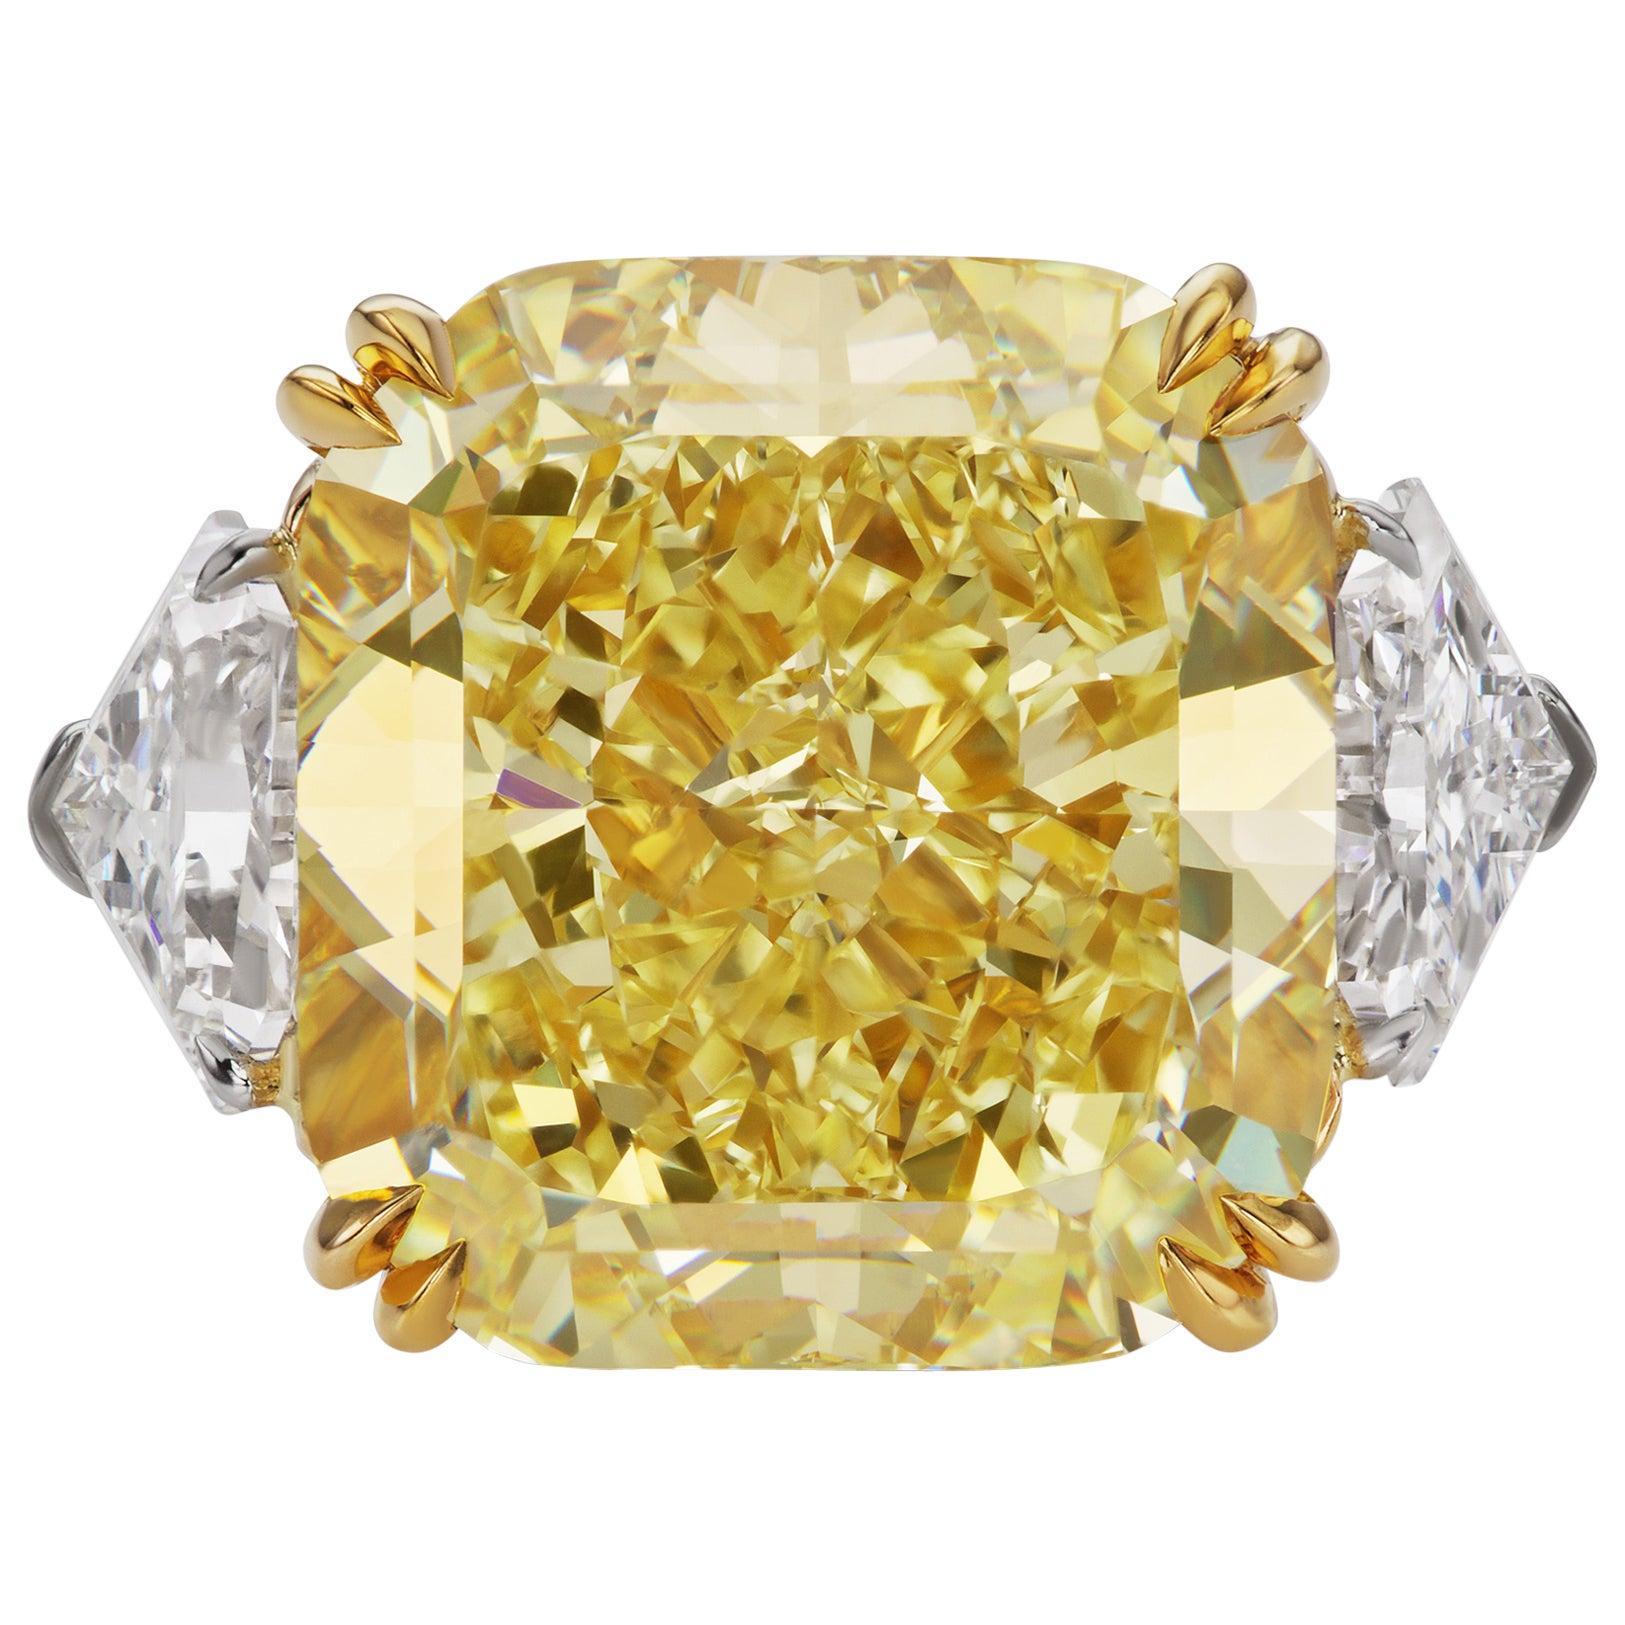 Scarselli 22 Carat Fancy Intense Yellow Diamond GIA in a Platinum Ring